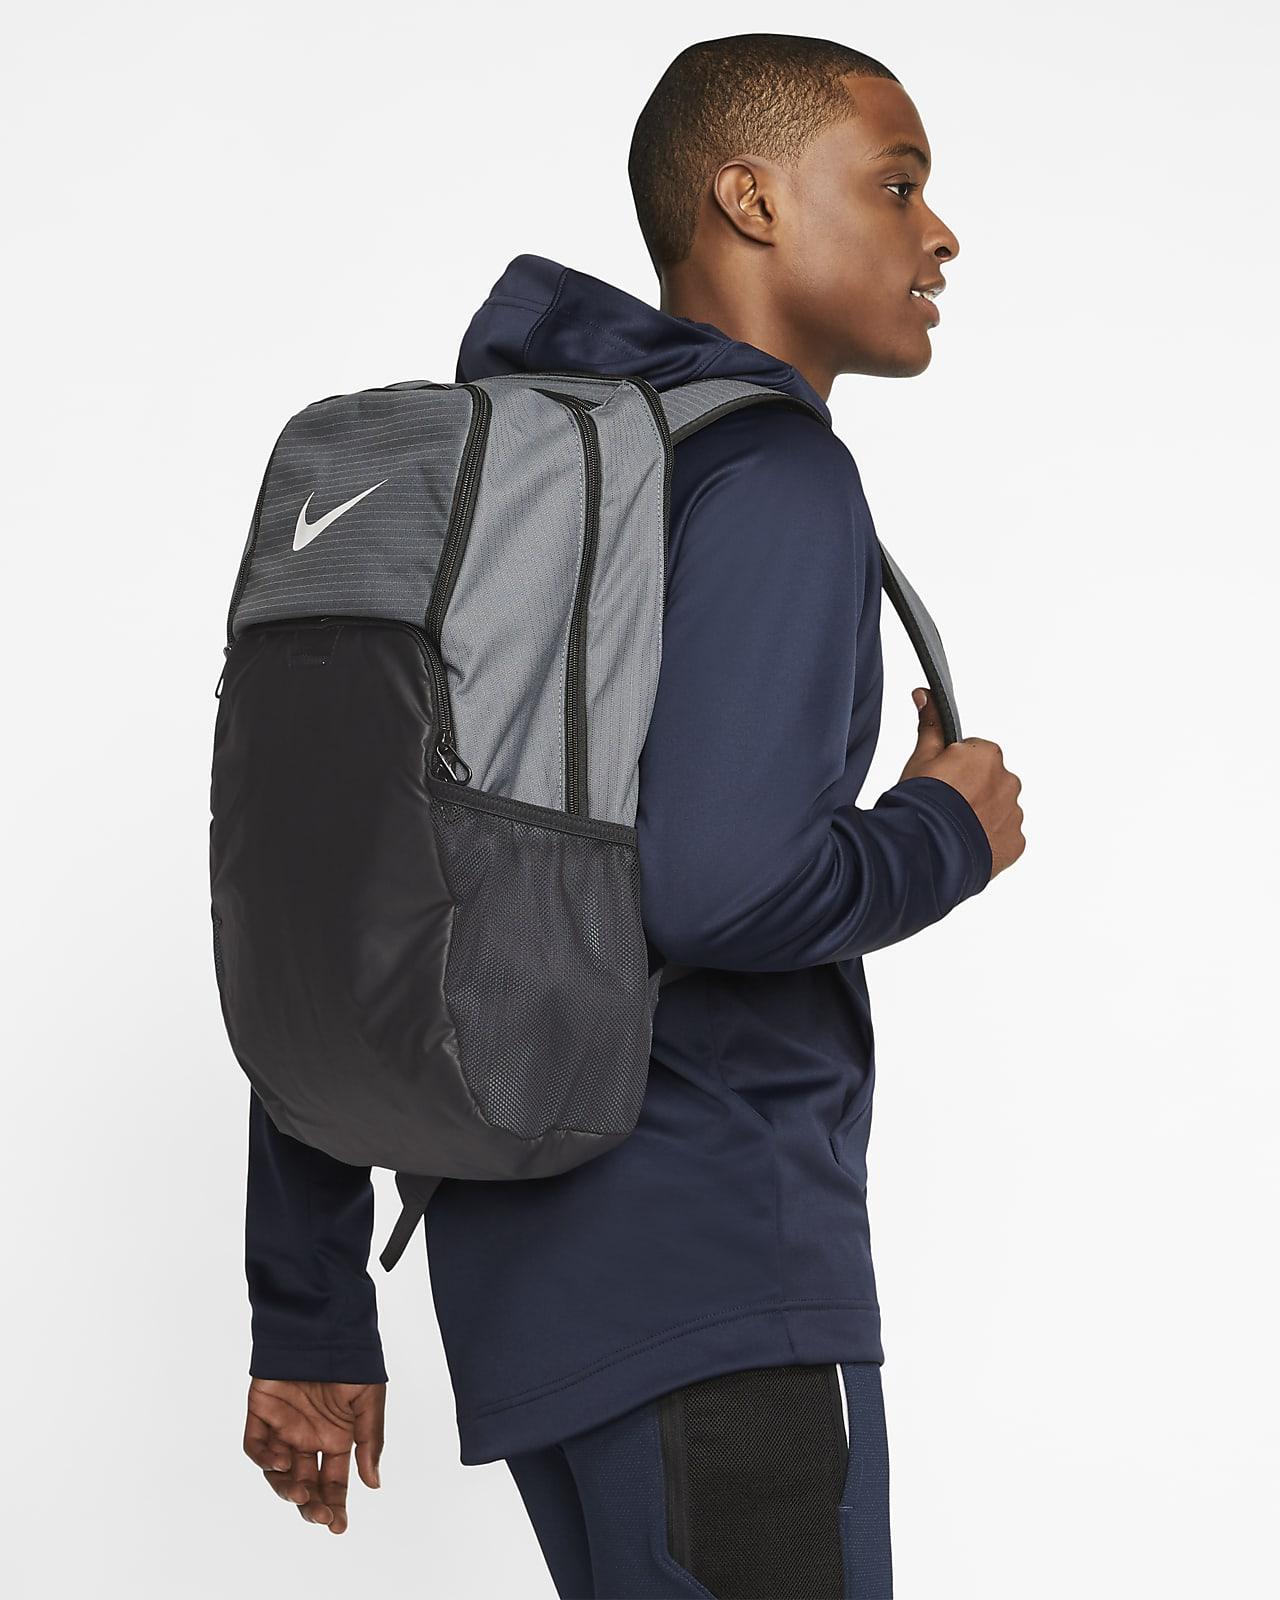 Nike Brasilia Trainingsrucksack (Größe XL)